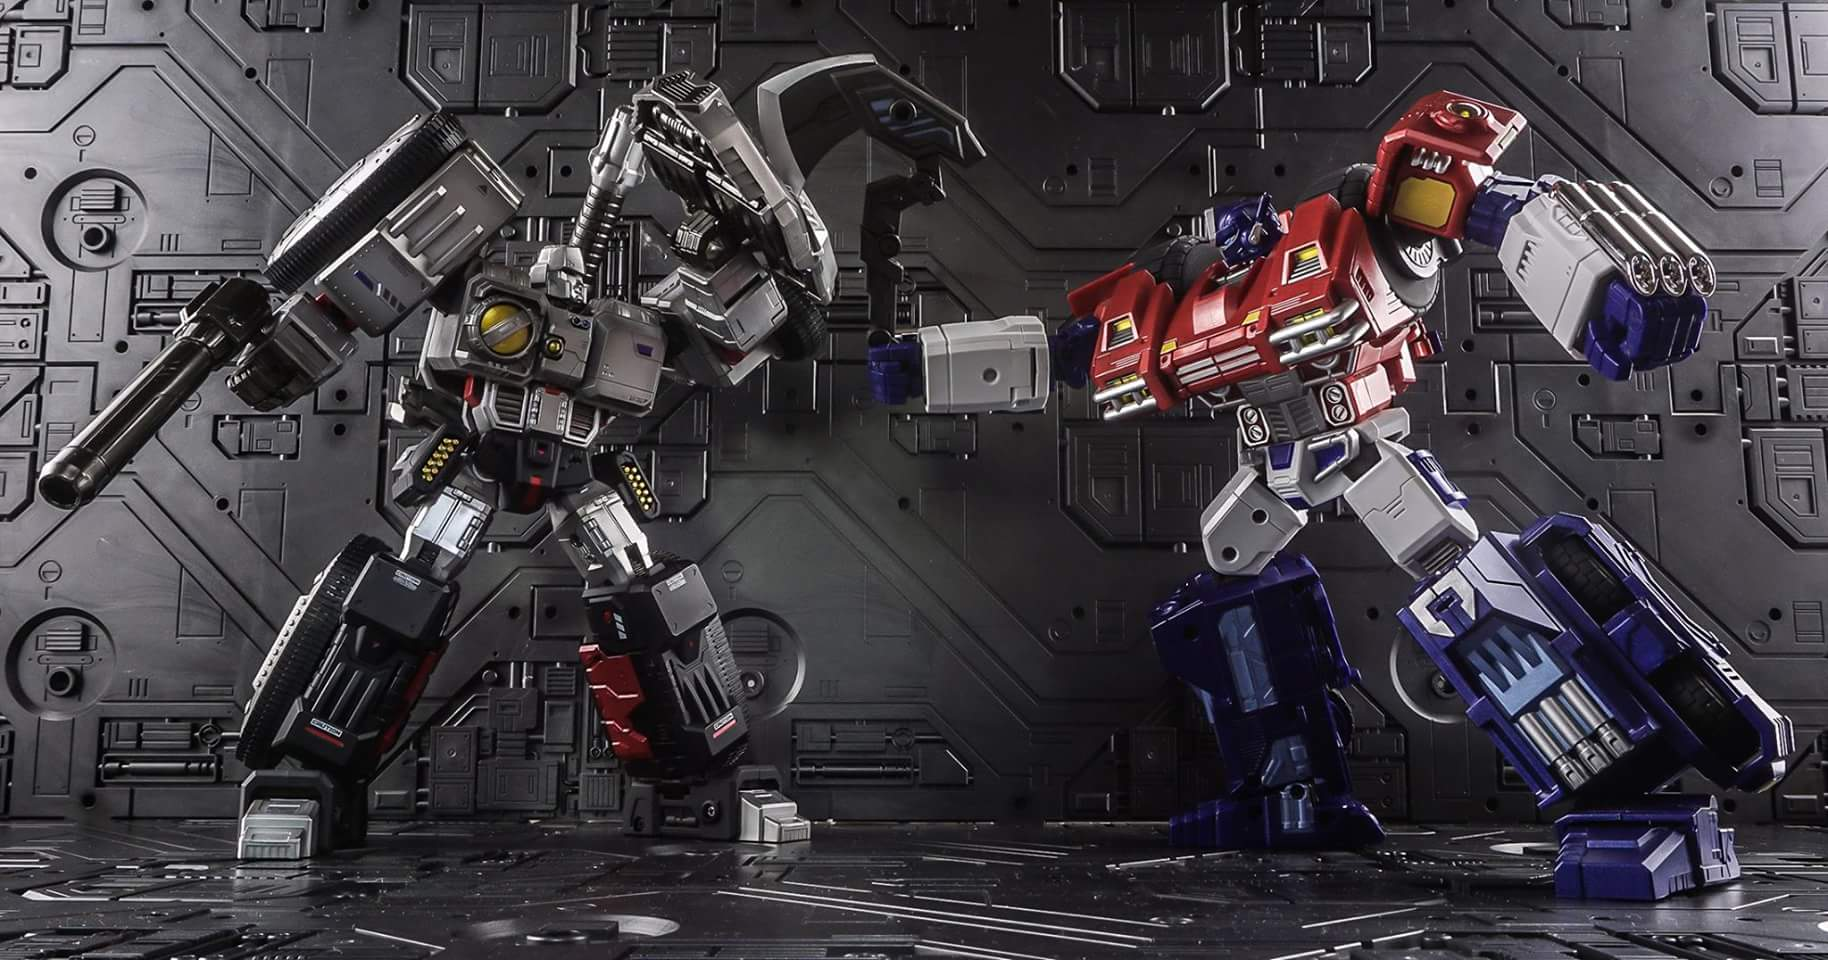 [SparkToys] Produit Tiers - ST - aka War Within: Optimus, Mégatron, Grimlock/La Menace, etc - Page 2 B18ZMBXd